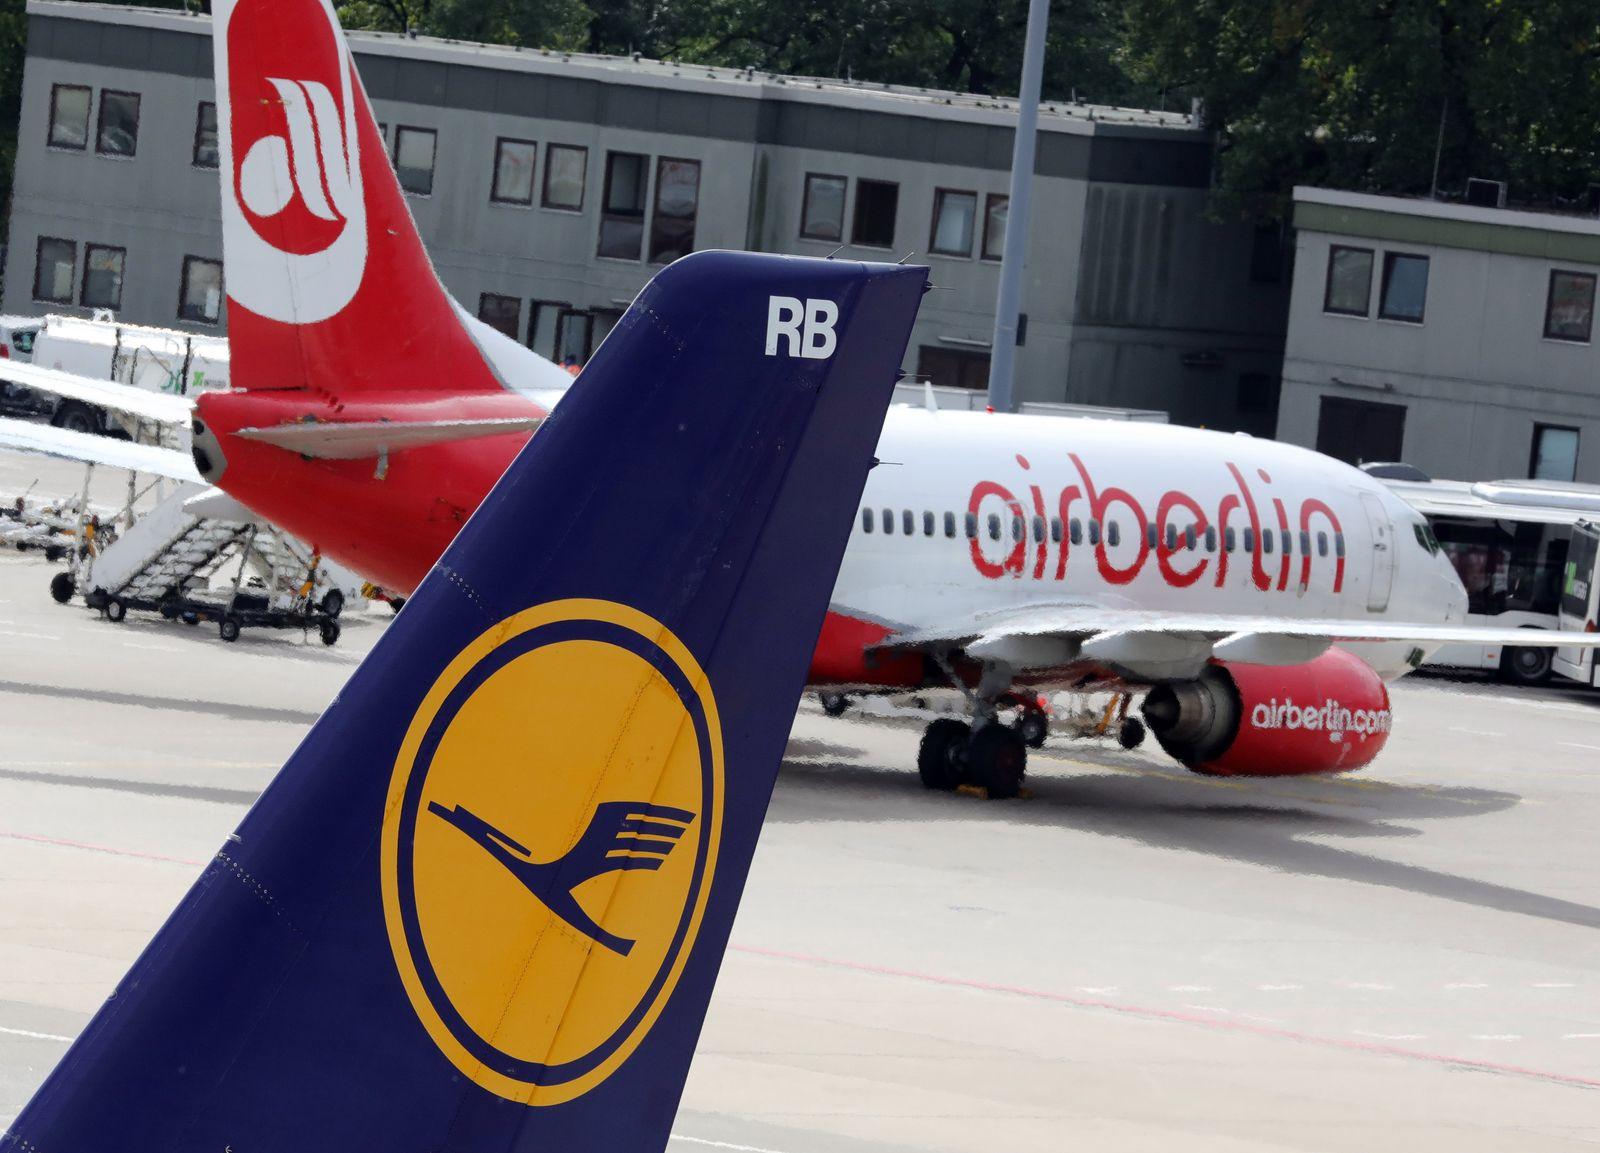 Air Berlin Lufthansa